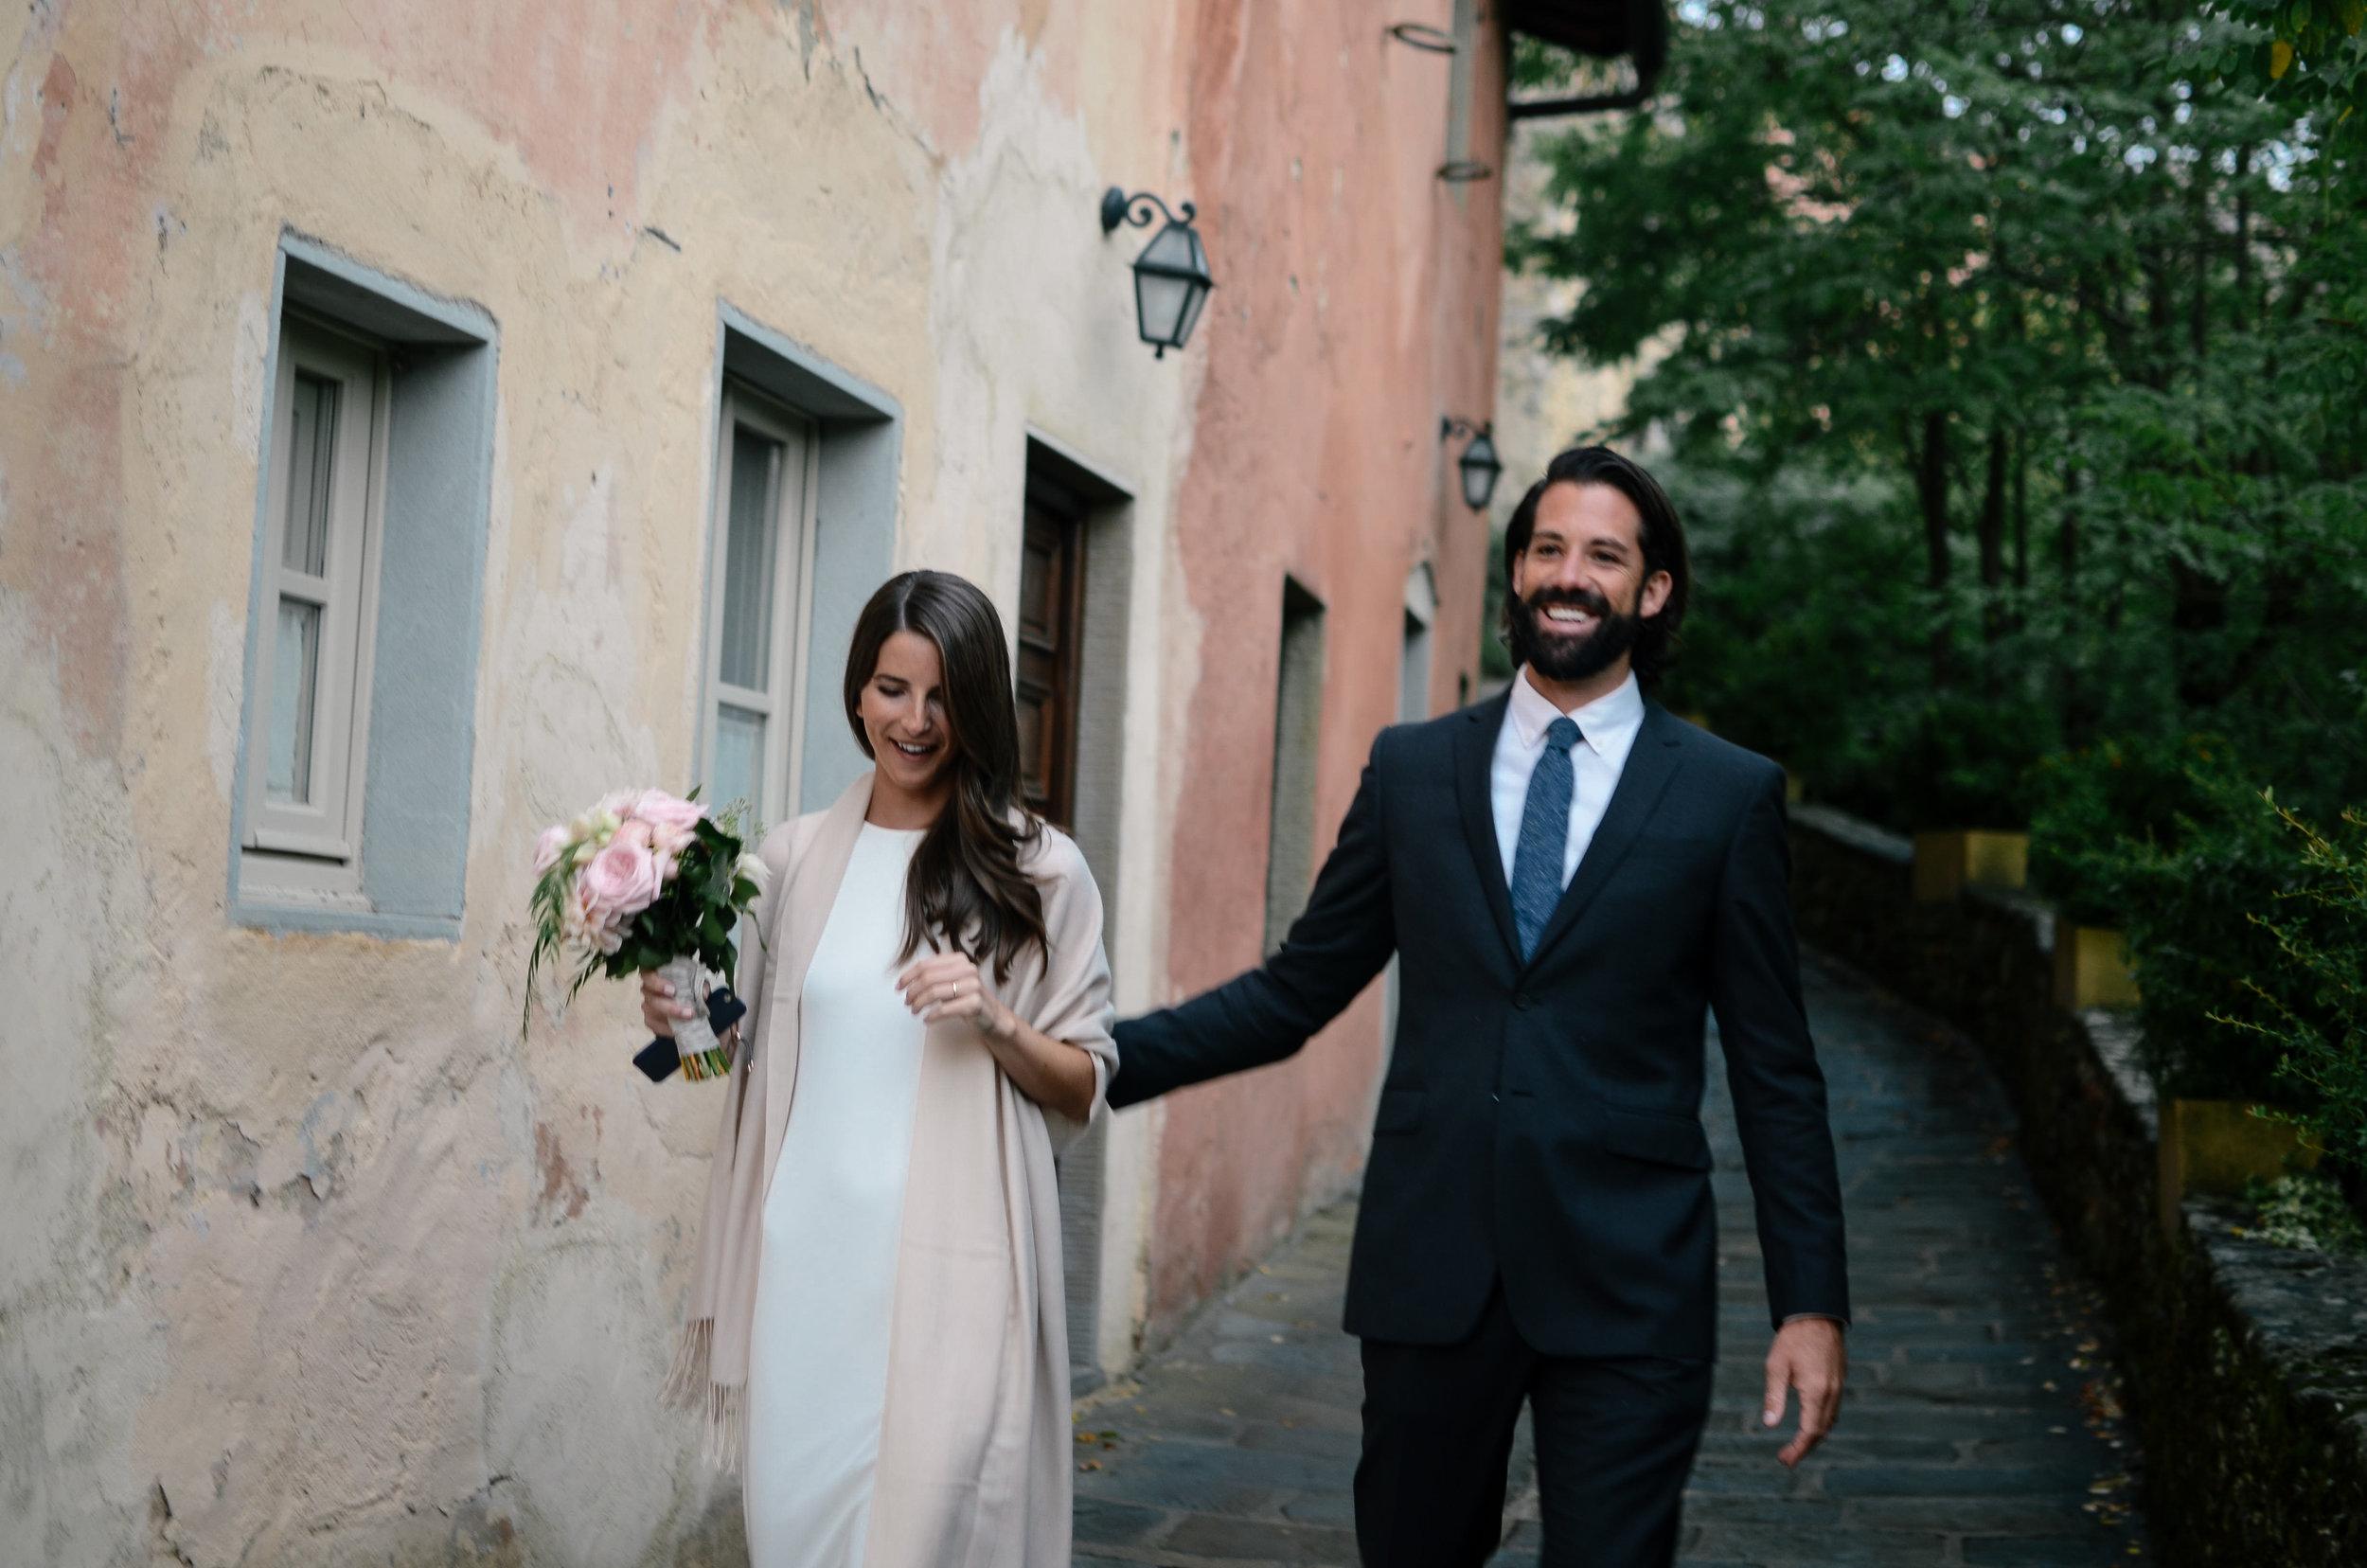 il-borro-toscana-wedding-tuscany-lifeonpine_Photo Oct 08, 8 24 18 AM.jpg